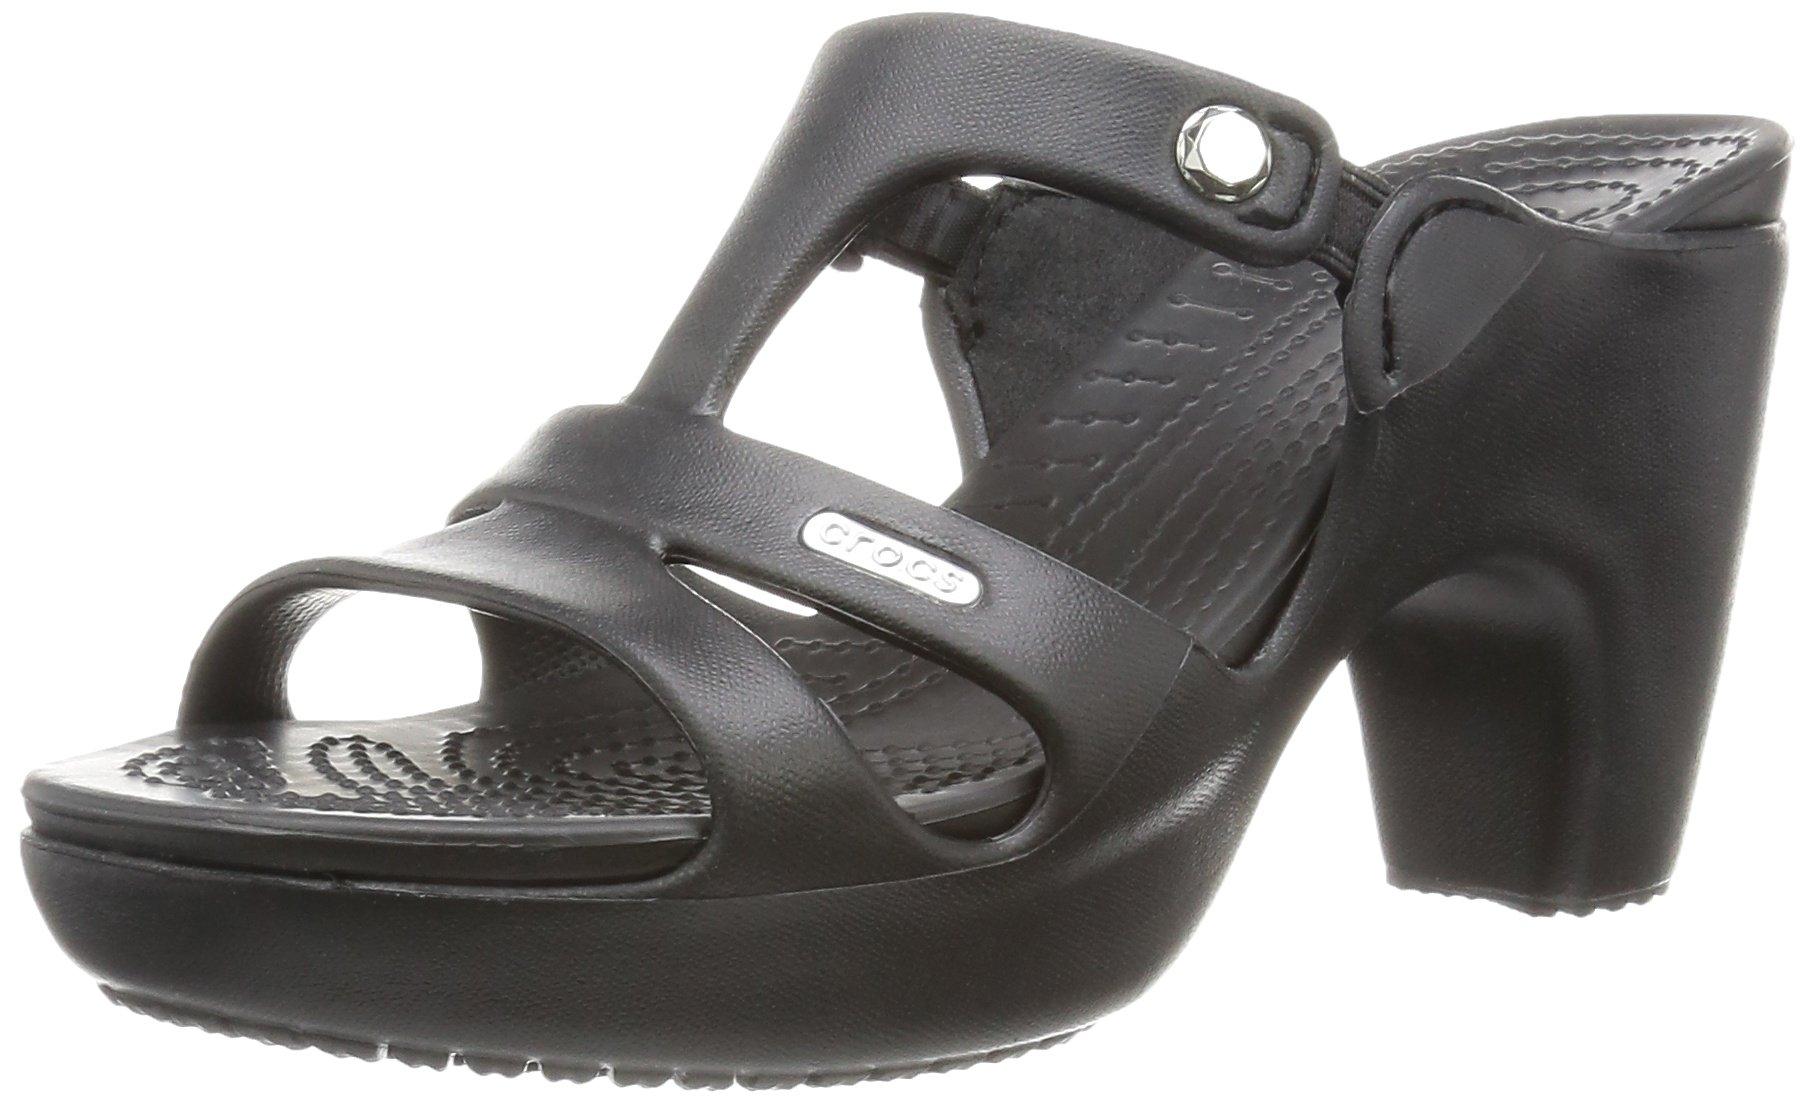 crocs Women's Cyprus V Heel W Dress Sandal, Black/Black, 9 B(M) US